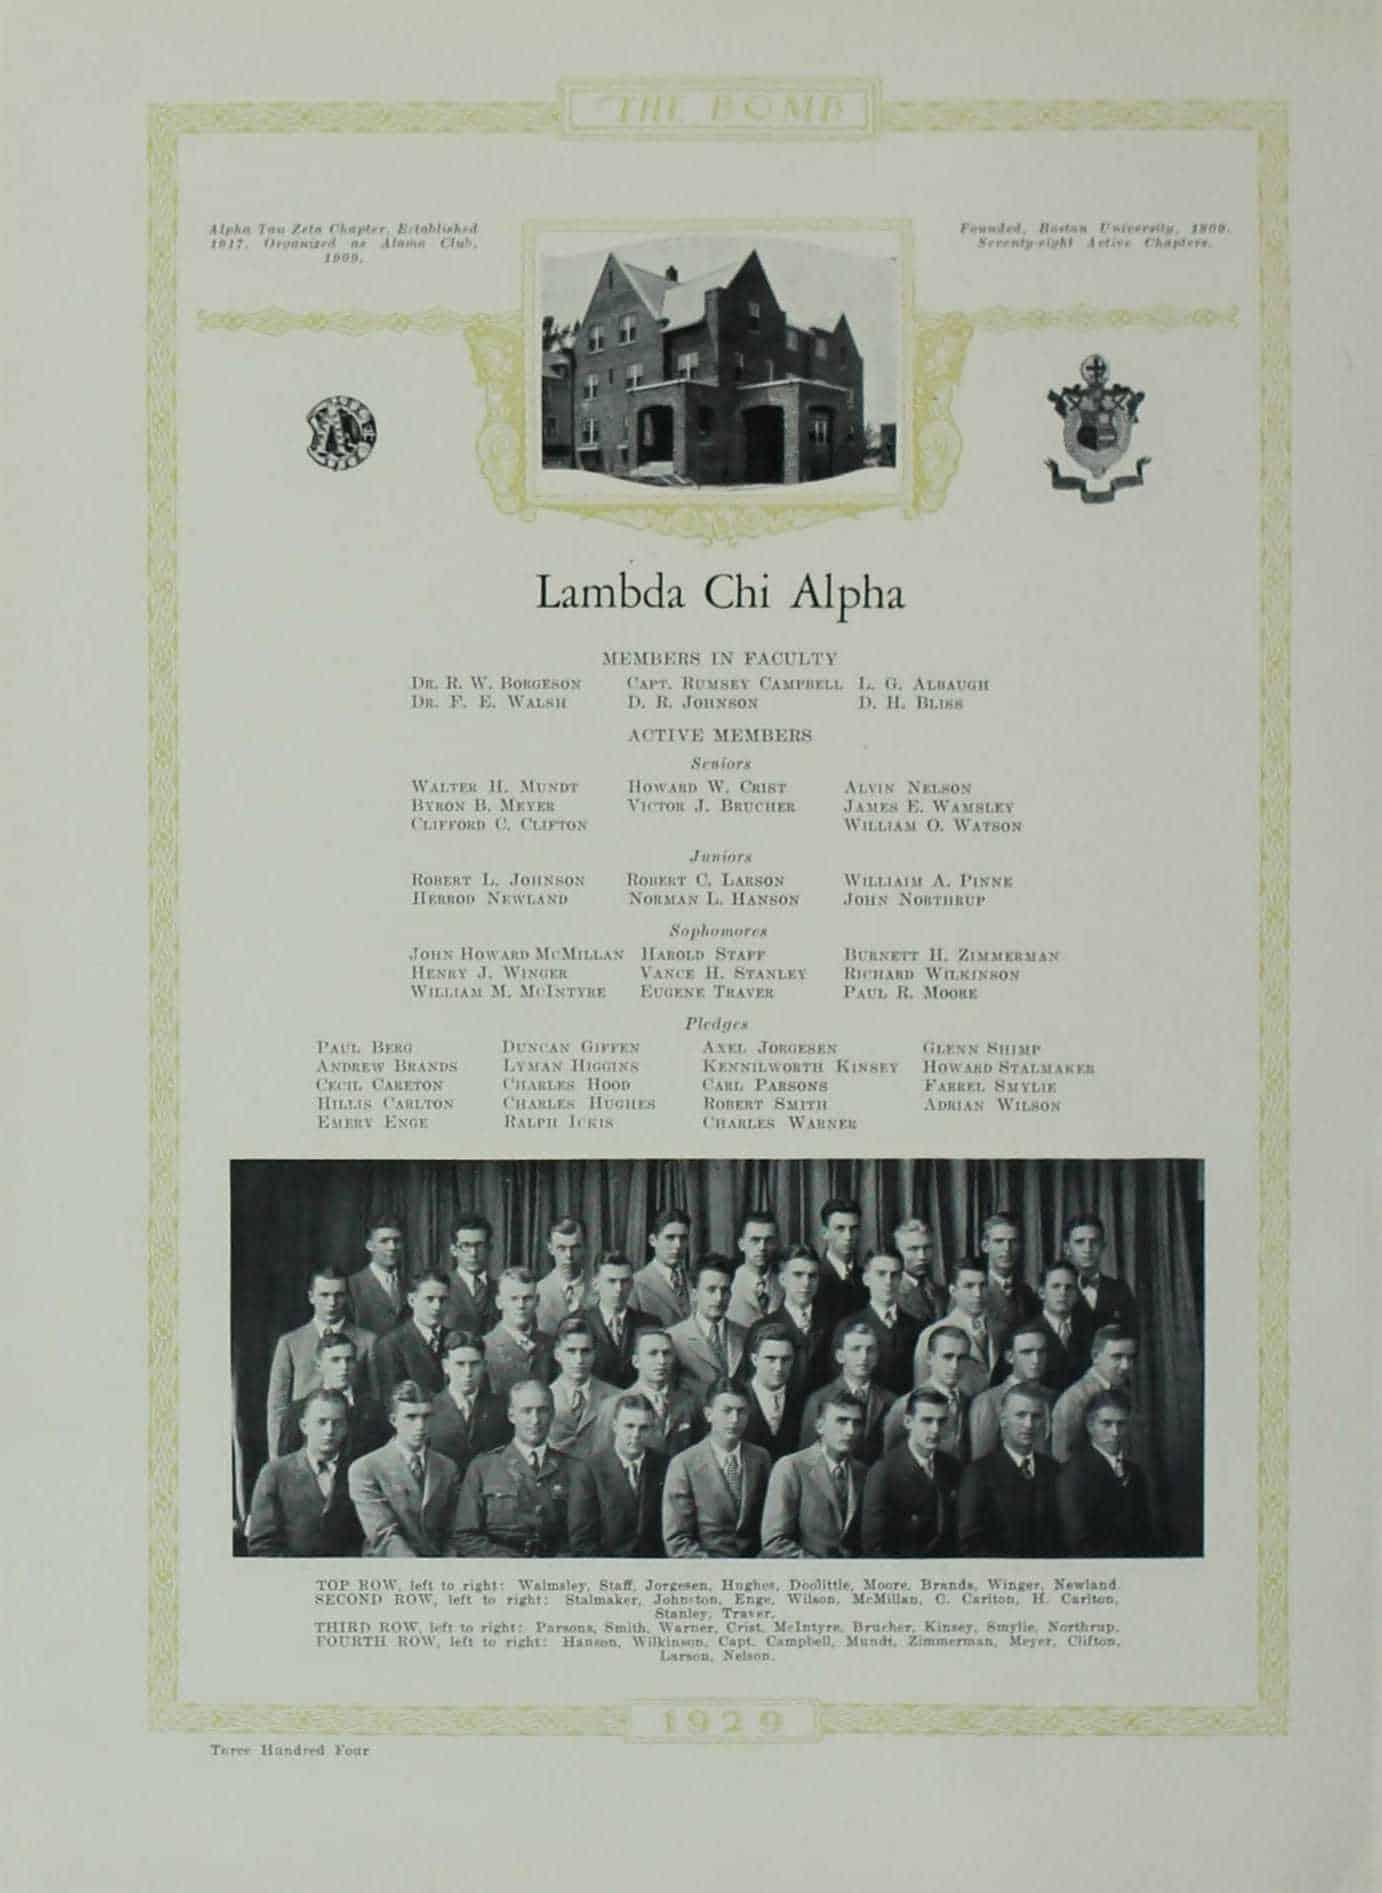 1929 Lambda Chi Alpha